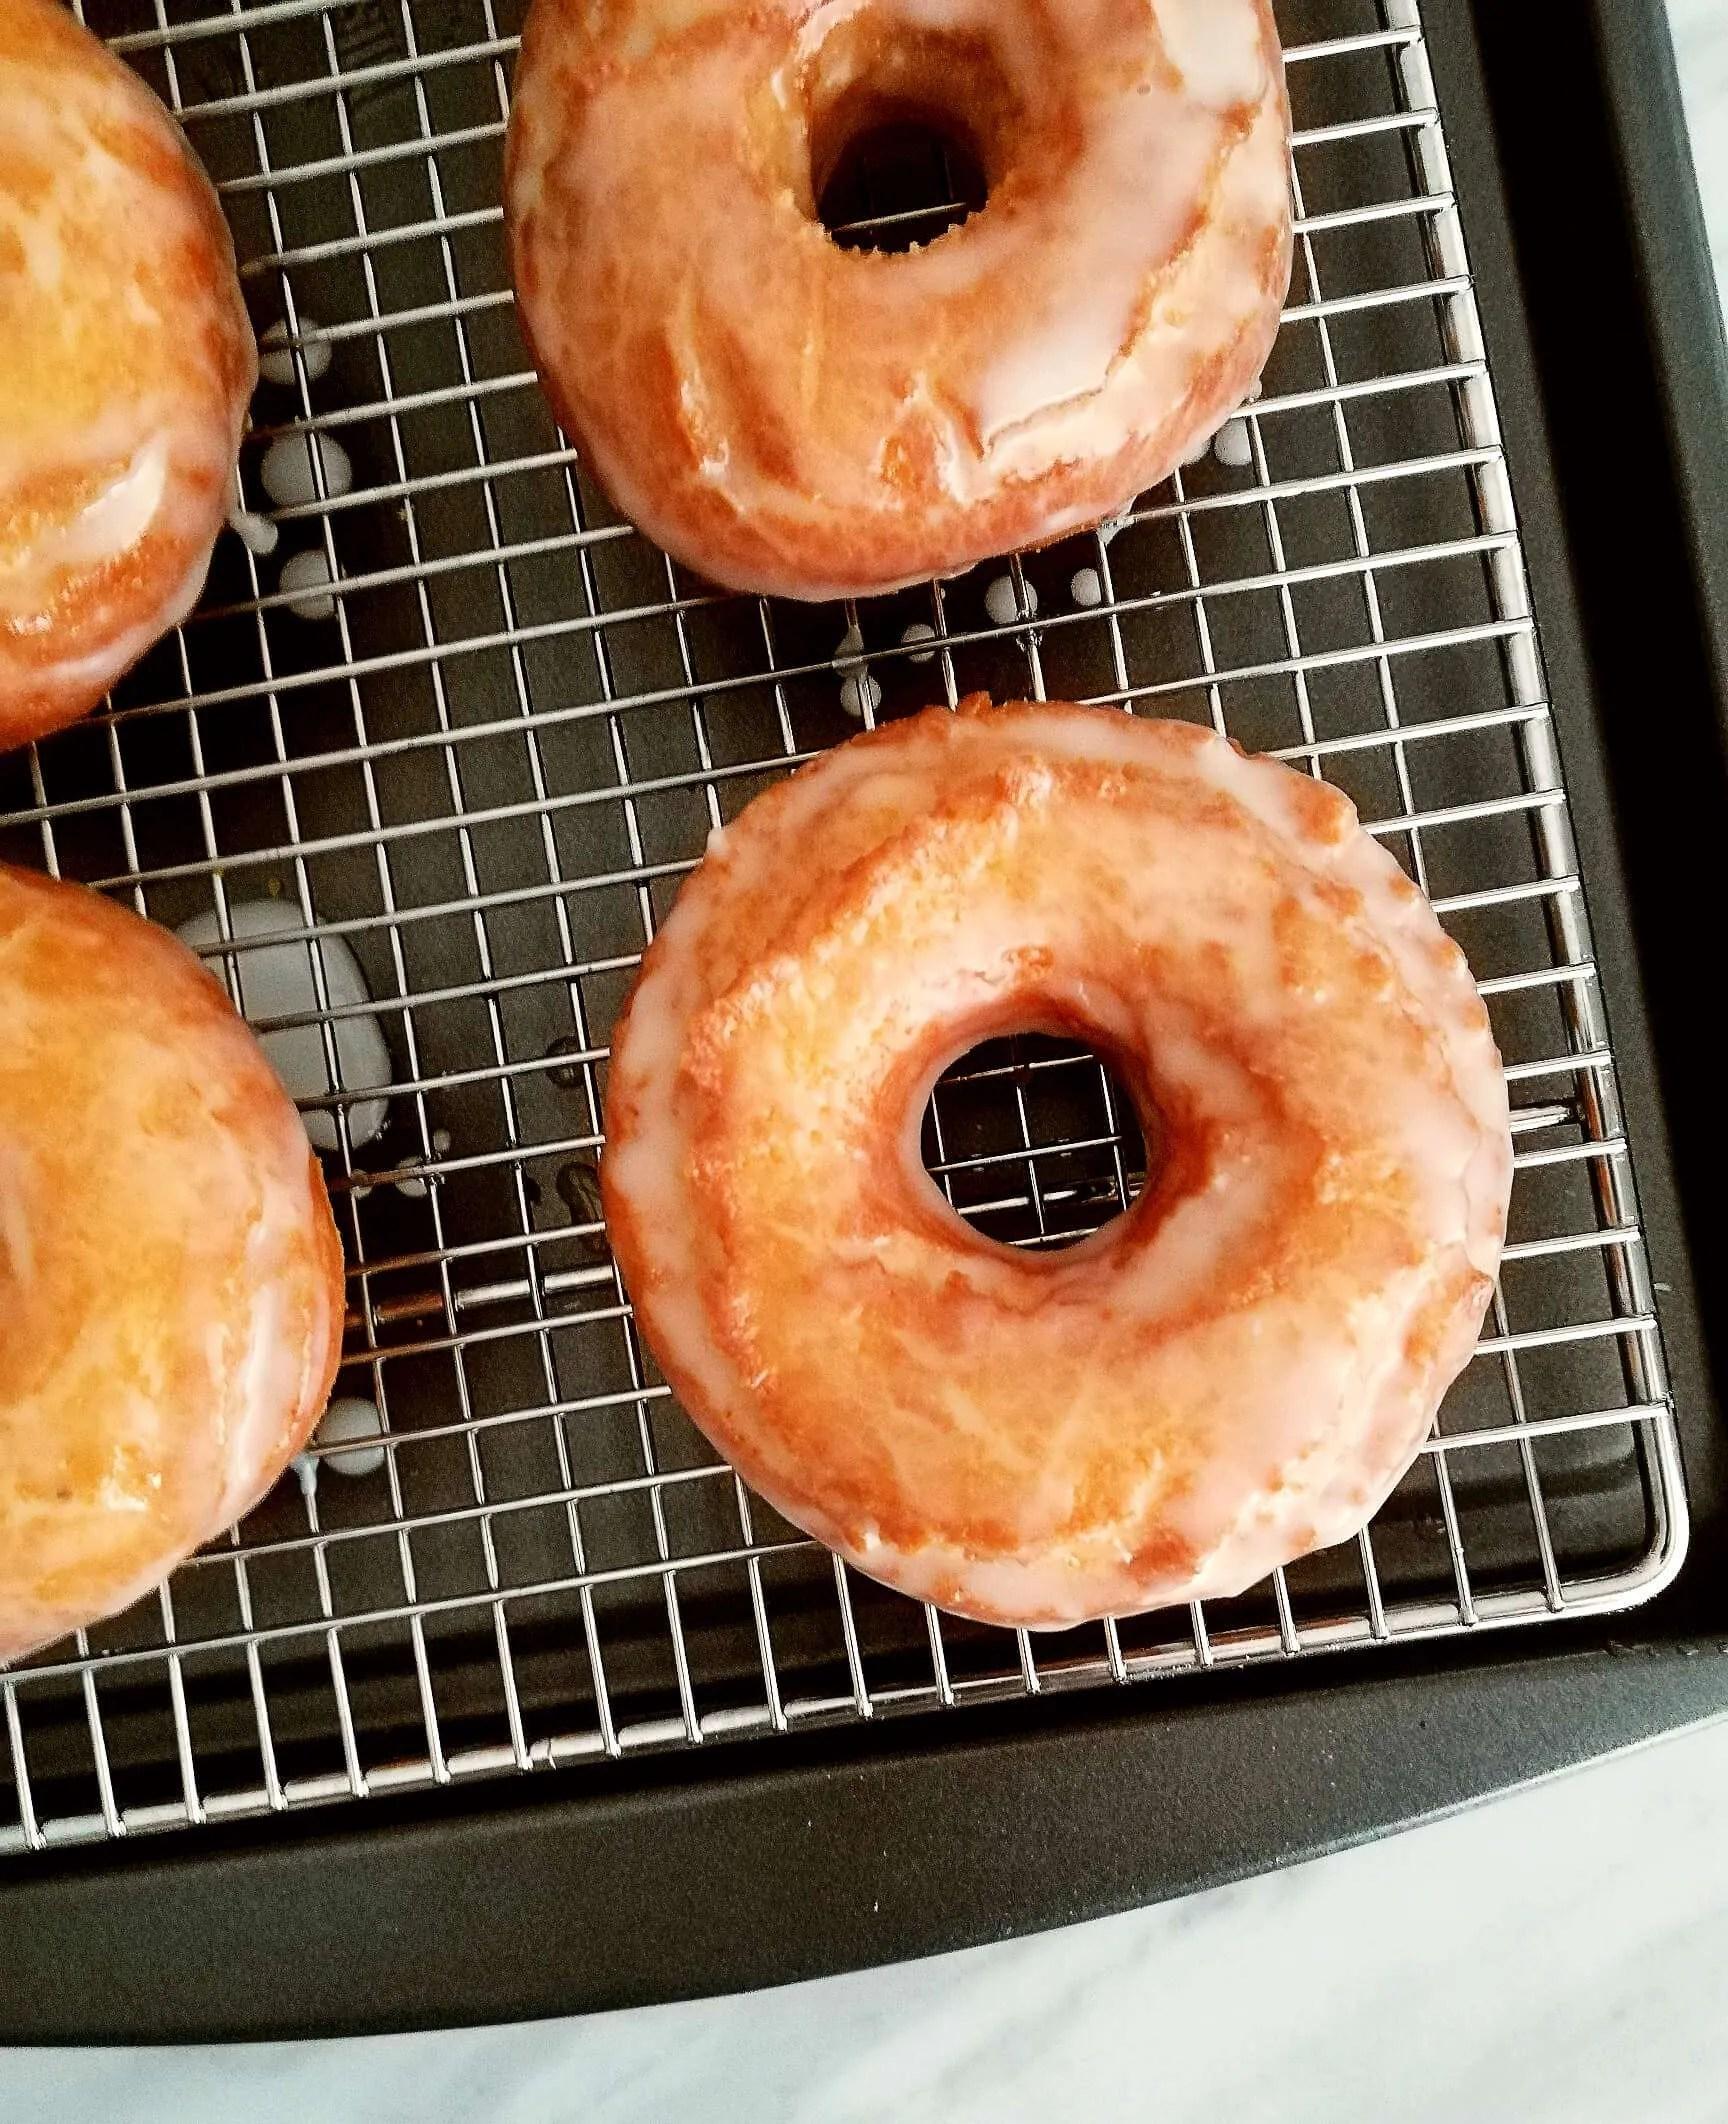 sour cream glazed donuts glazed overhead